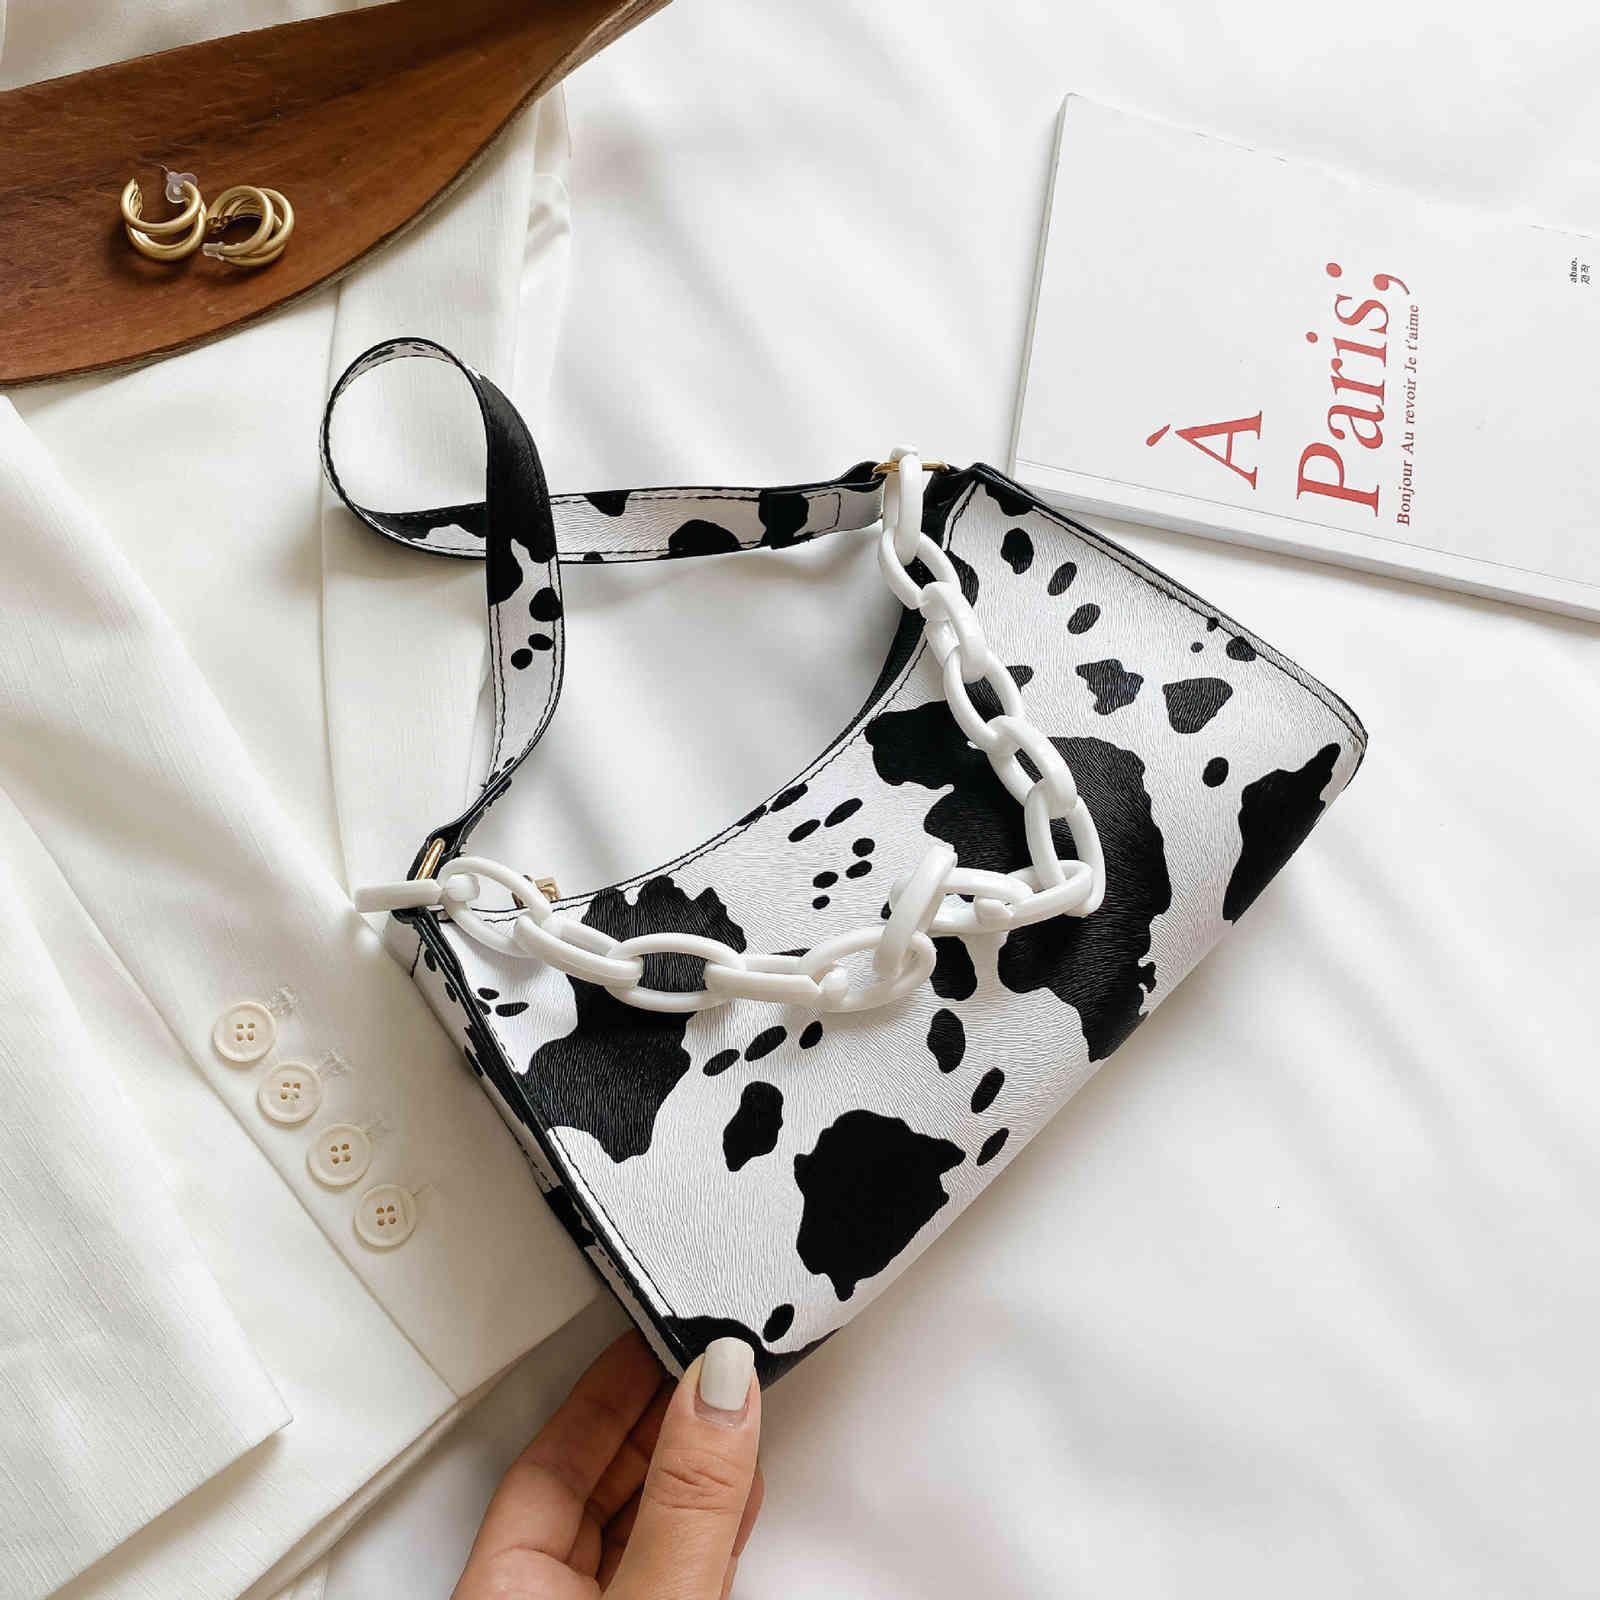 cow wallets Bag women's style crowdsourcing femininity French pattern armpit sti bag portable single shoulder